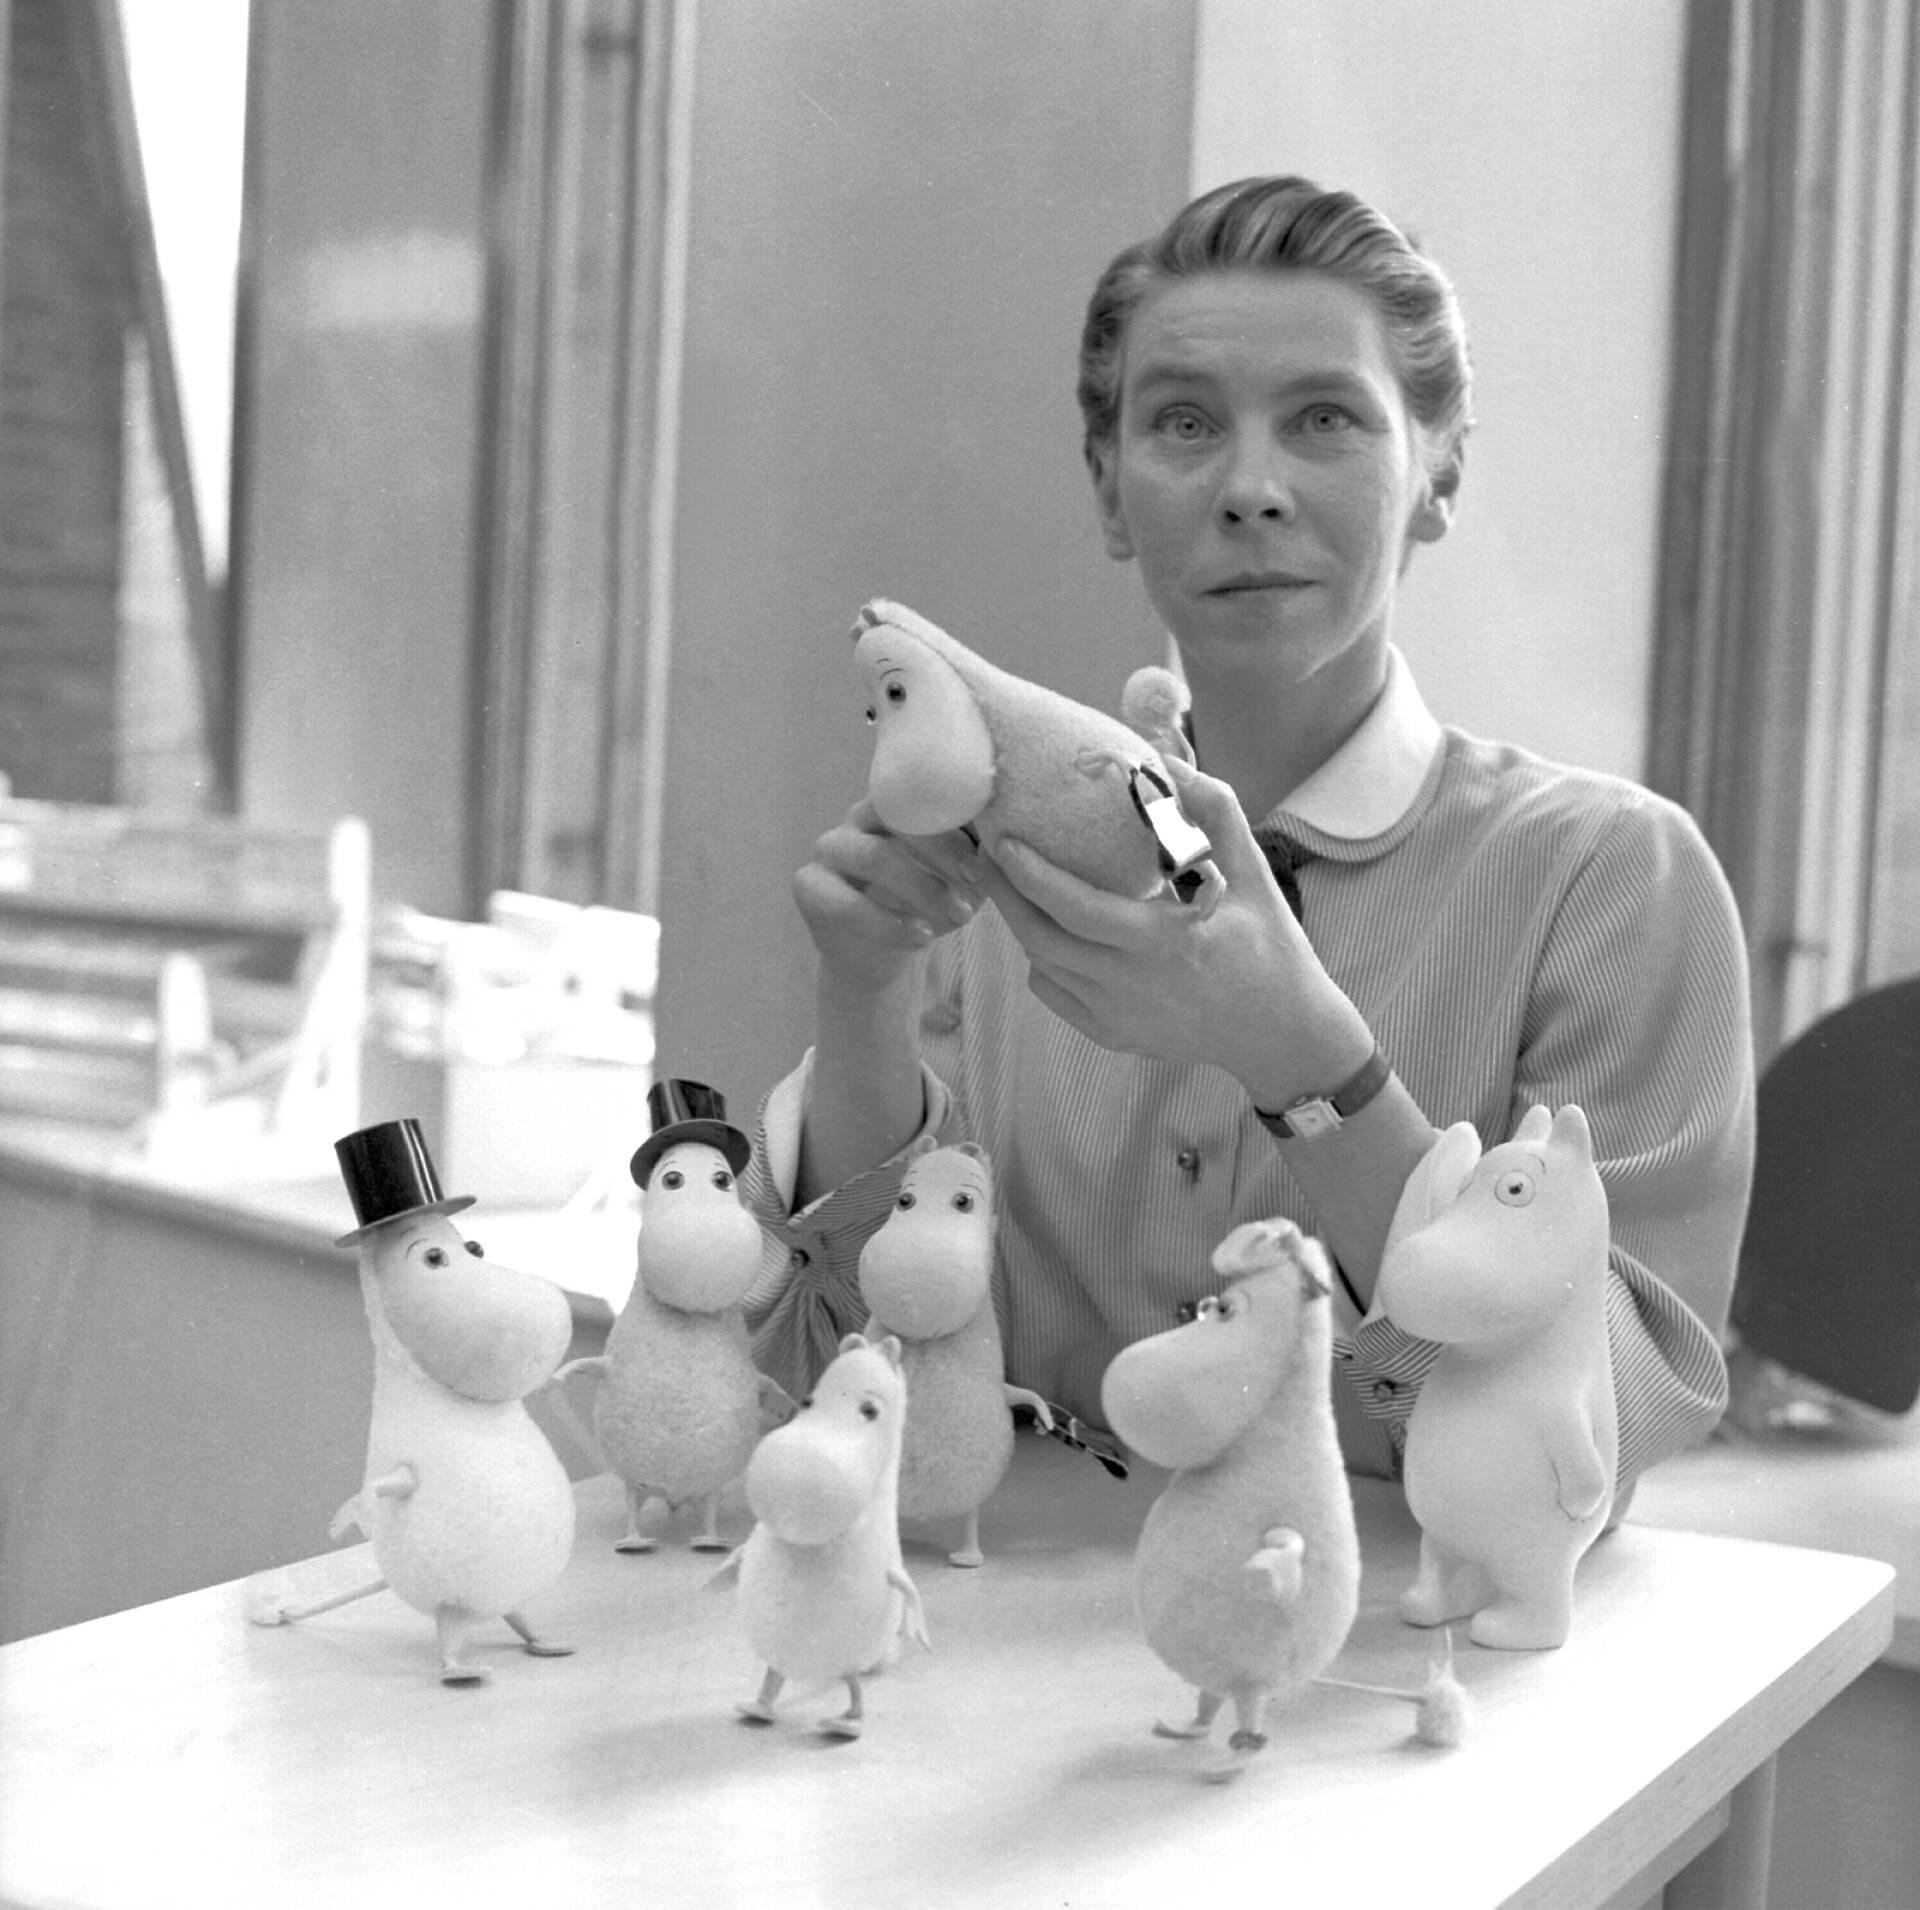 https://upload.wikimedia.org/wikipedia/commons/b/bc/Tove_Jansson_1956.jpg